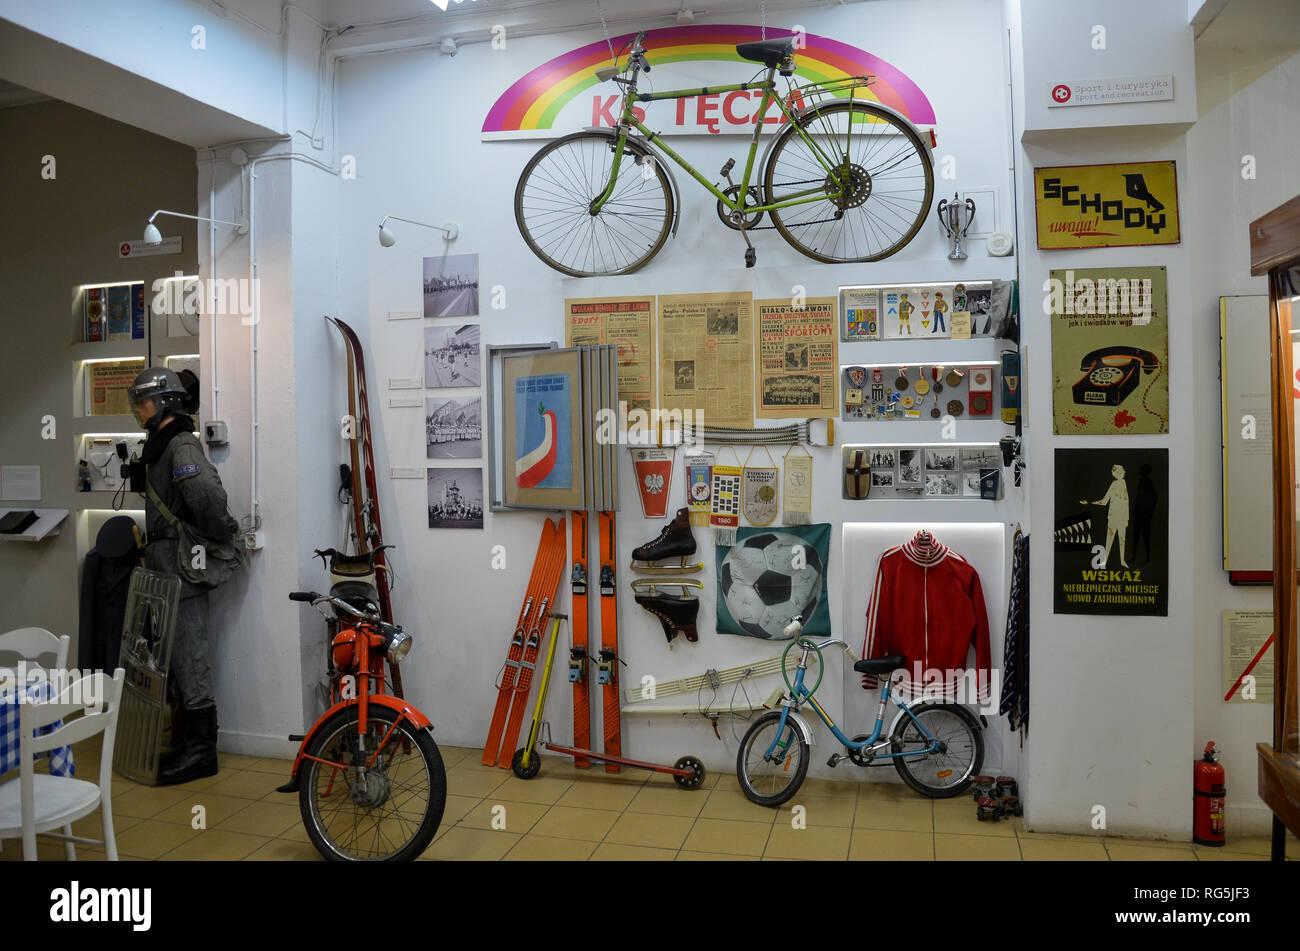 Czar PRL (Museum of Life Under Communism) in the Praga district, east Warsaw, Poland, November 2018 - Stock Image